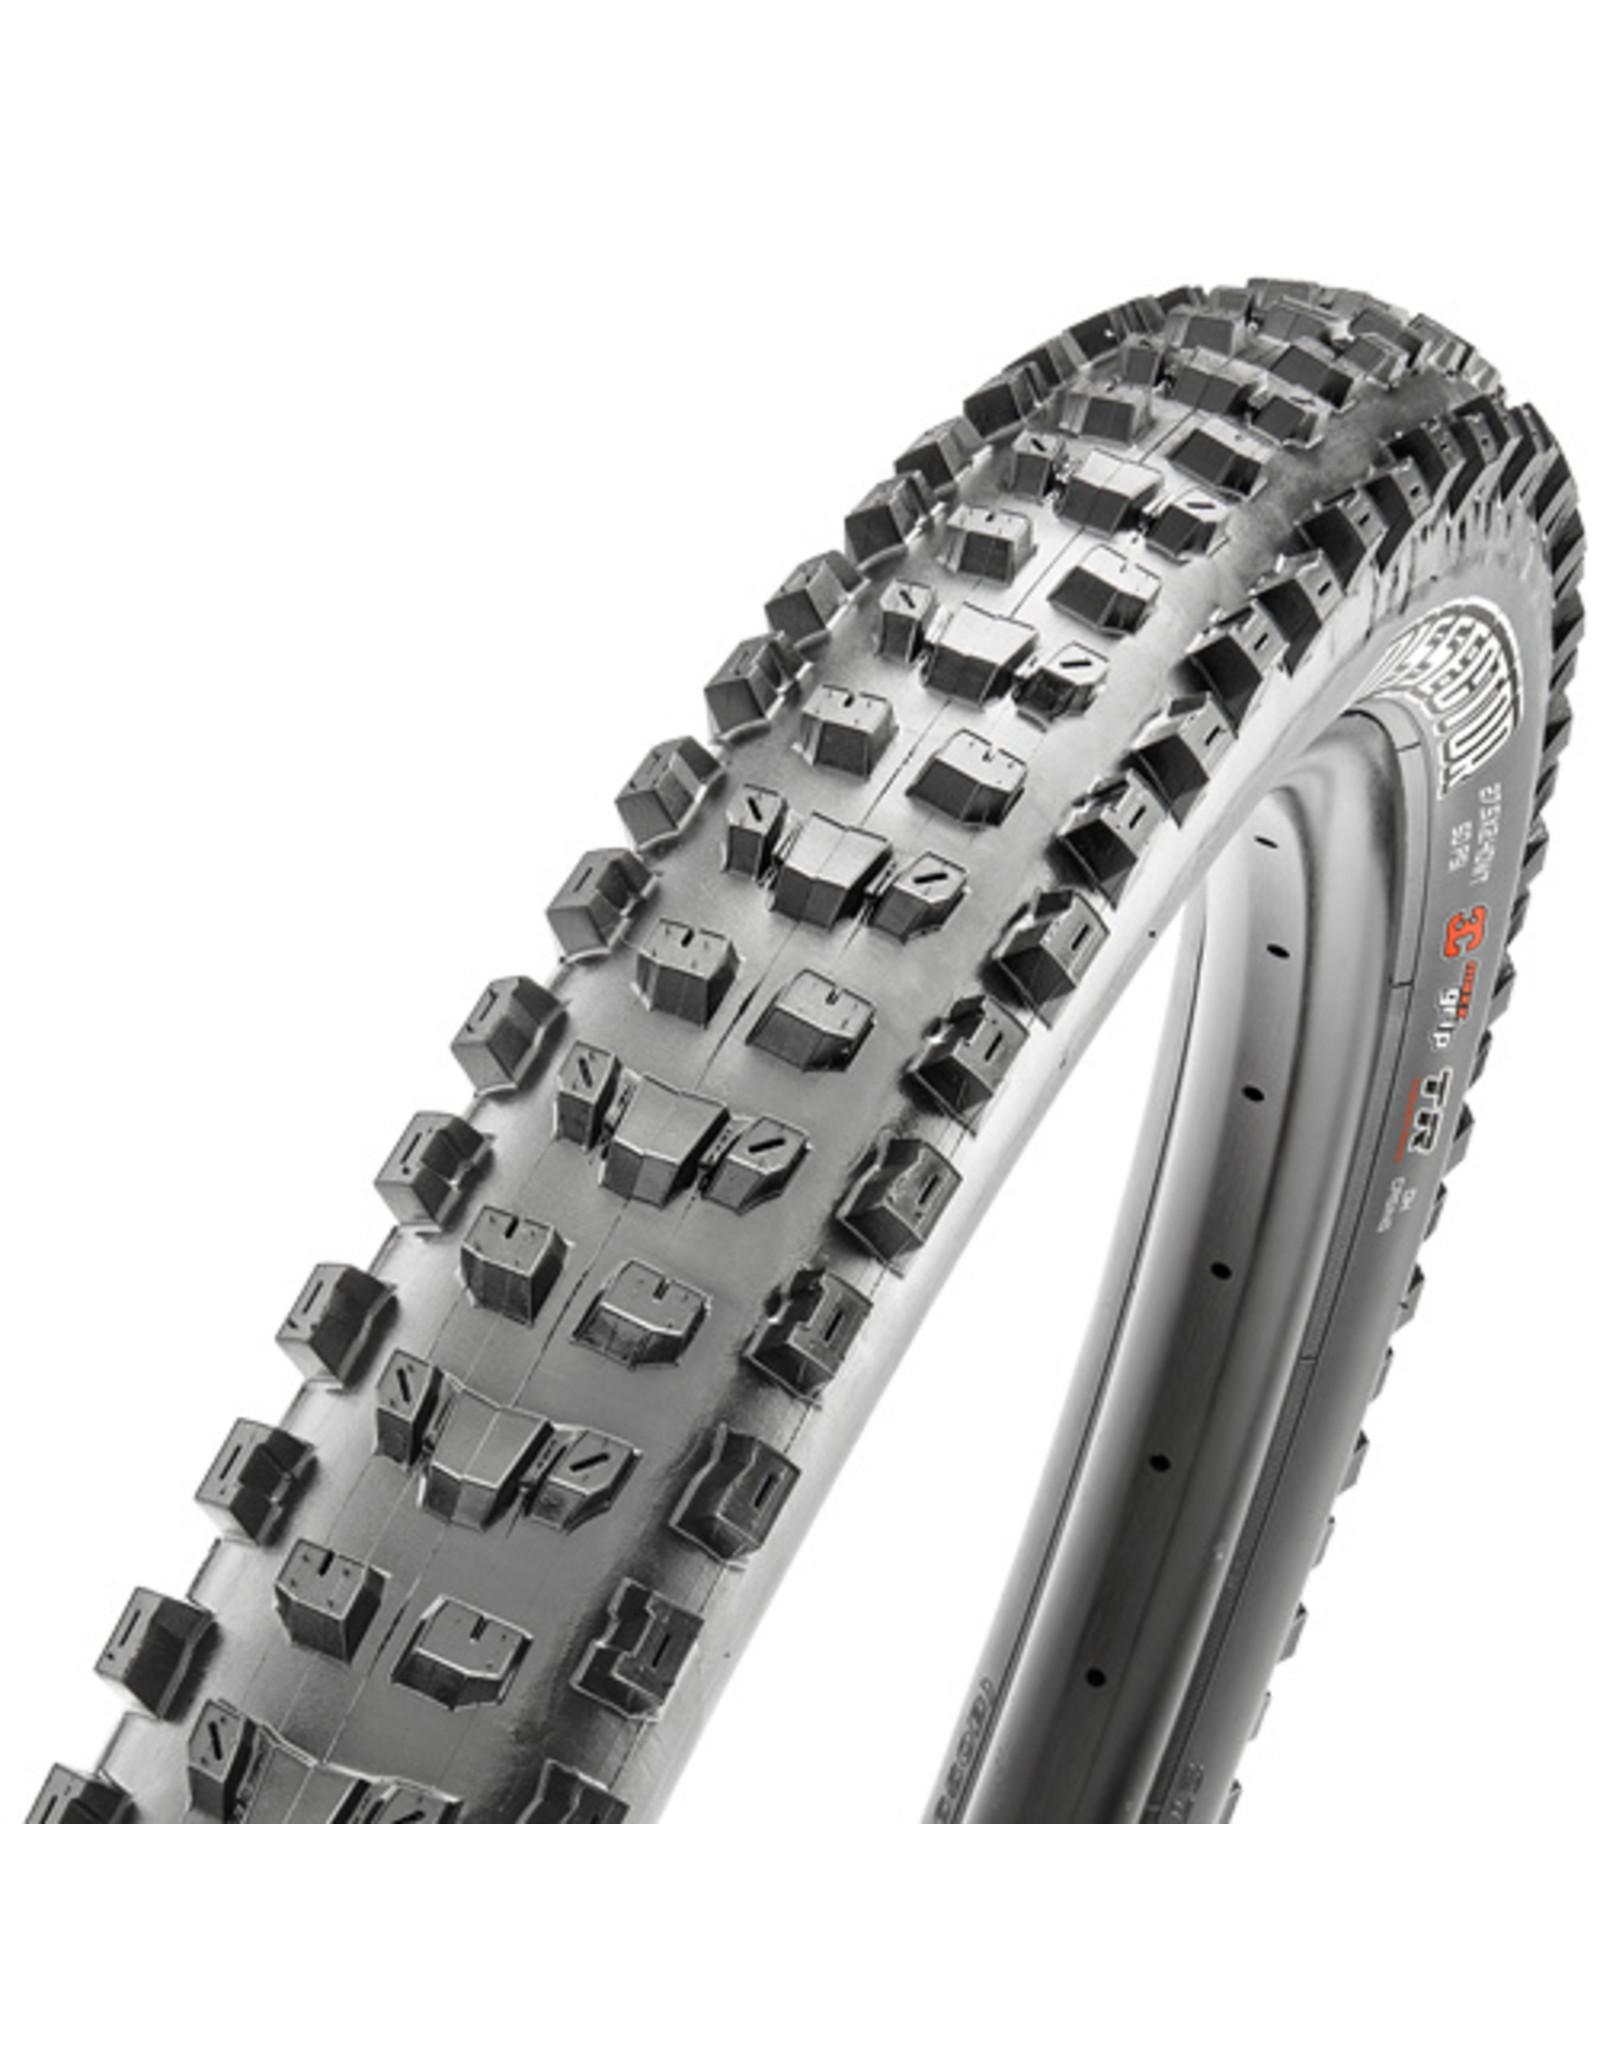 Maxxis Maxxis Dissector Tire - 29 x 2.4, Tubeless, Folding, Black, 3C MaxxGrip, DH, Wide Trail